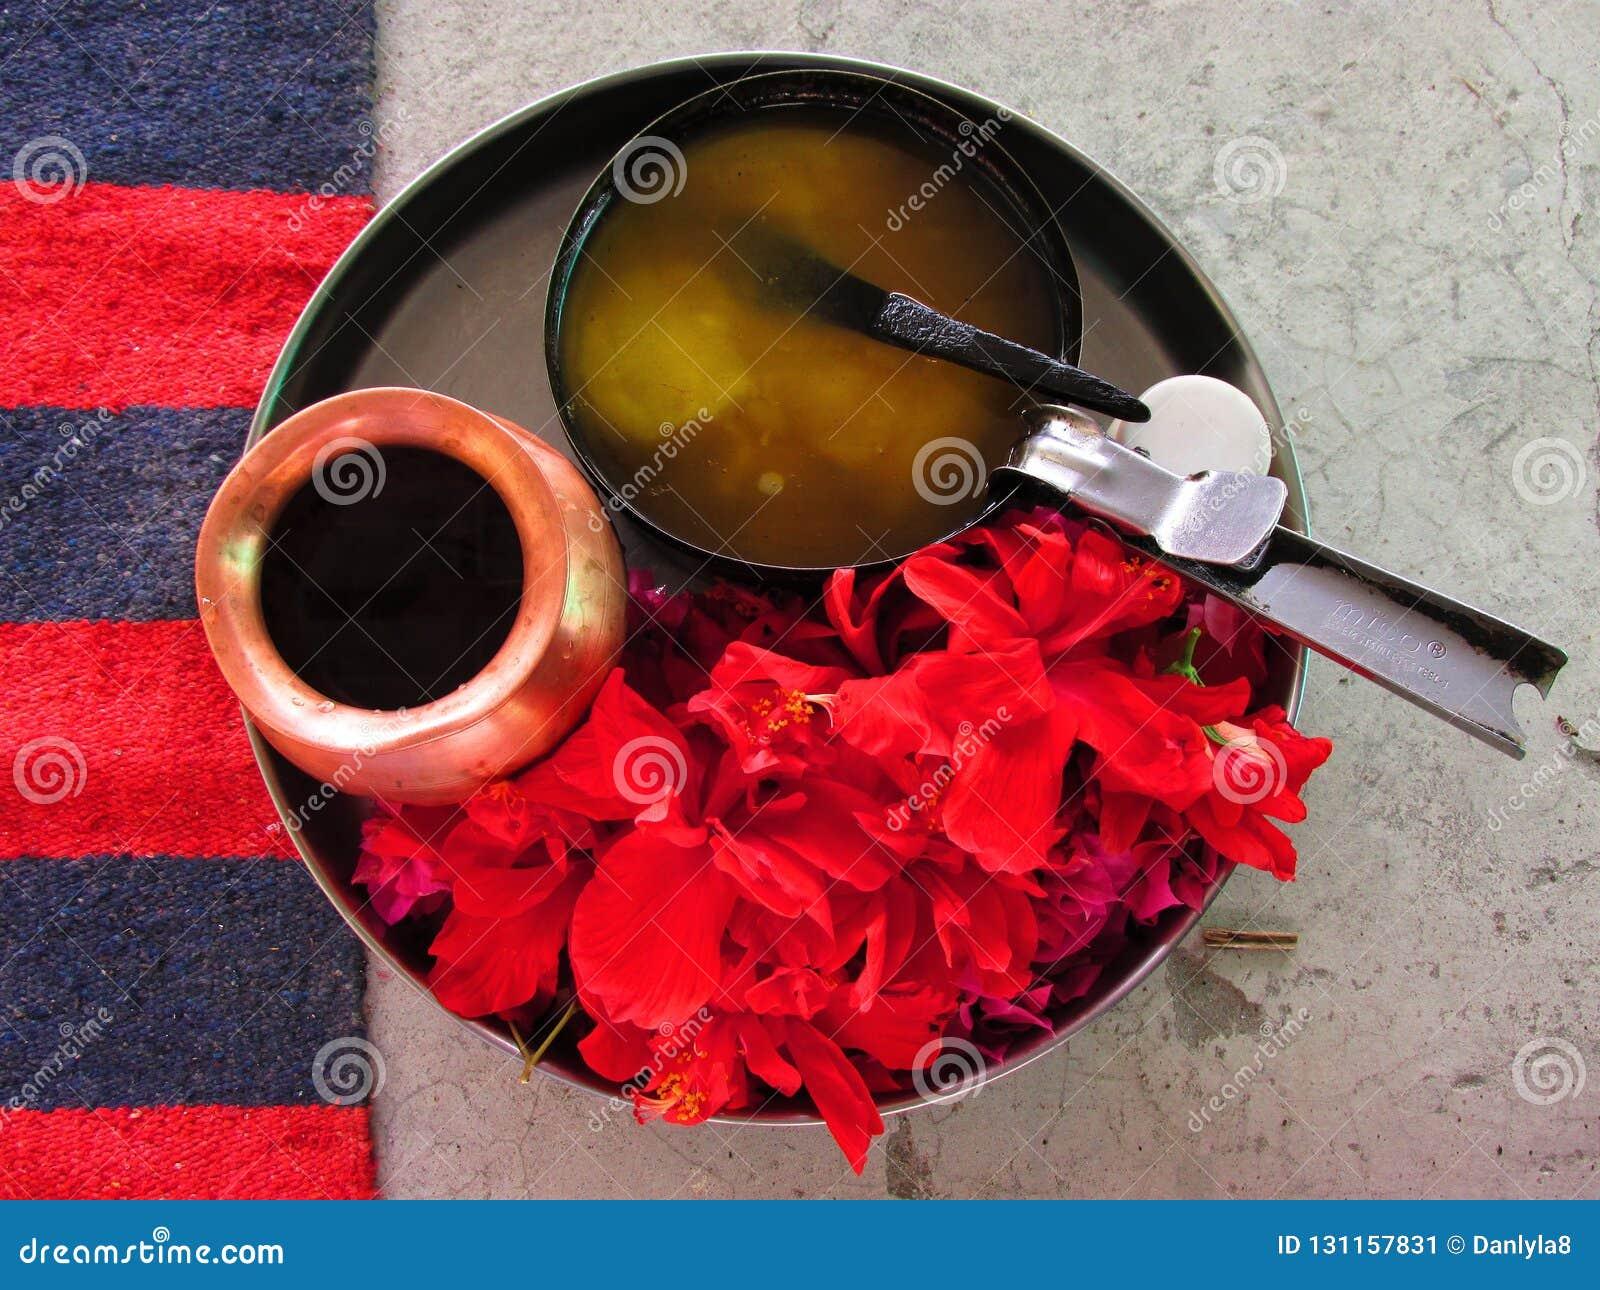 Homa - Hawan - Agni hotra: Items for the Hindu fire ritual